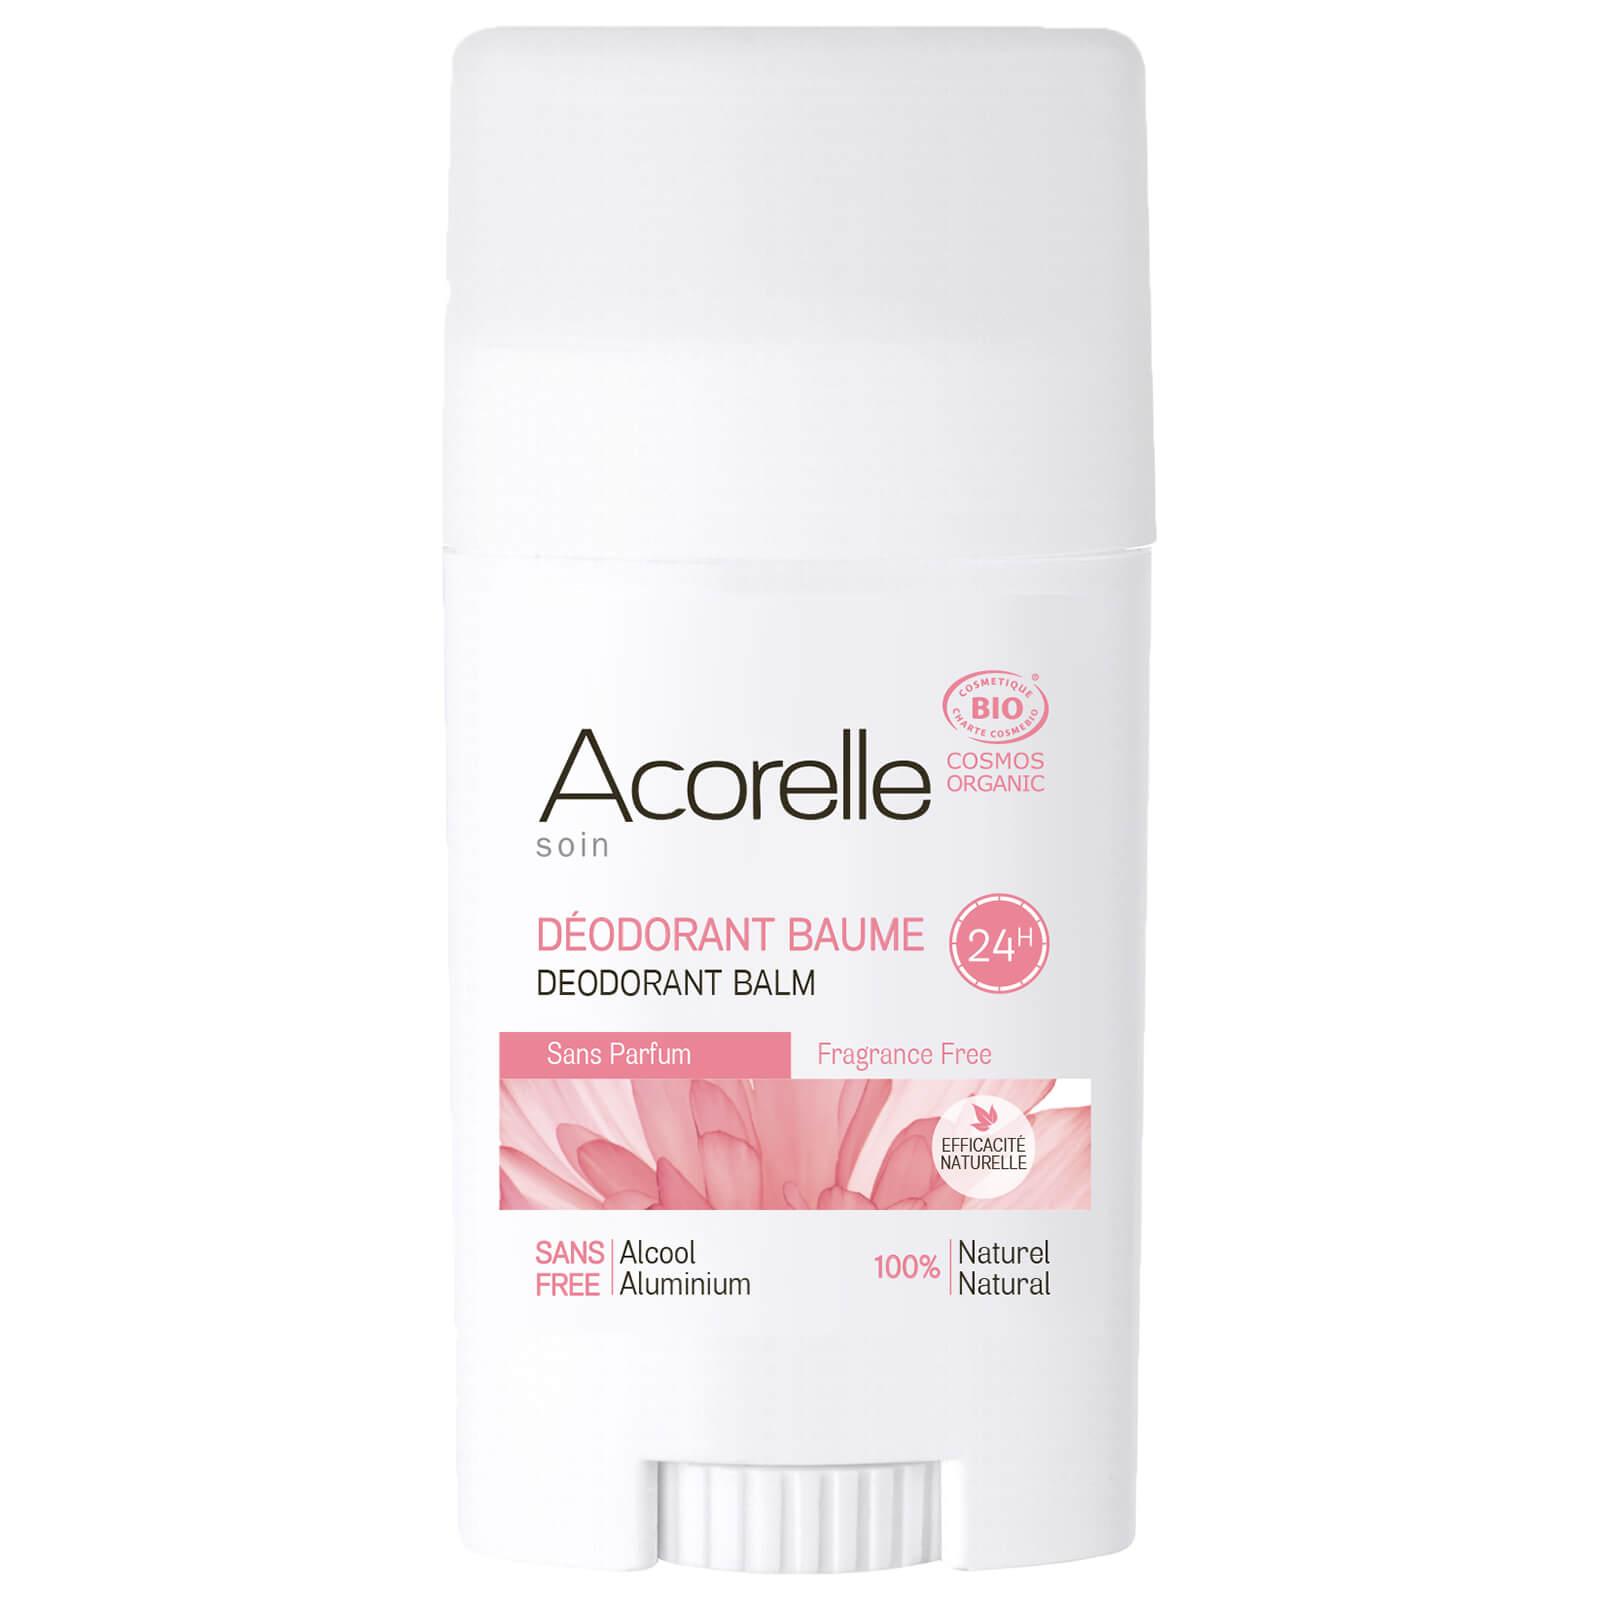 Acorelle Organic Fragrance Free Deodorant Balm 40g   Free Shipping    Lookfantastic a7748b95d67